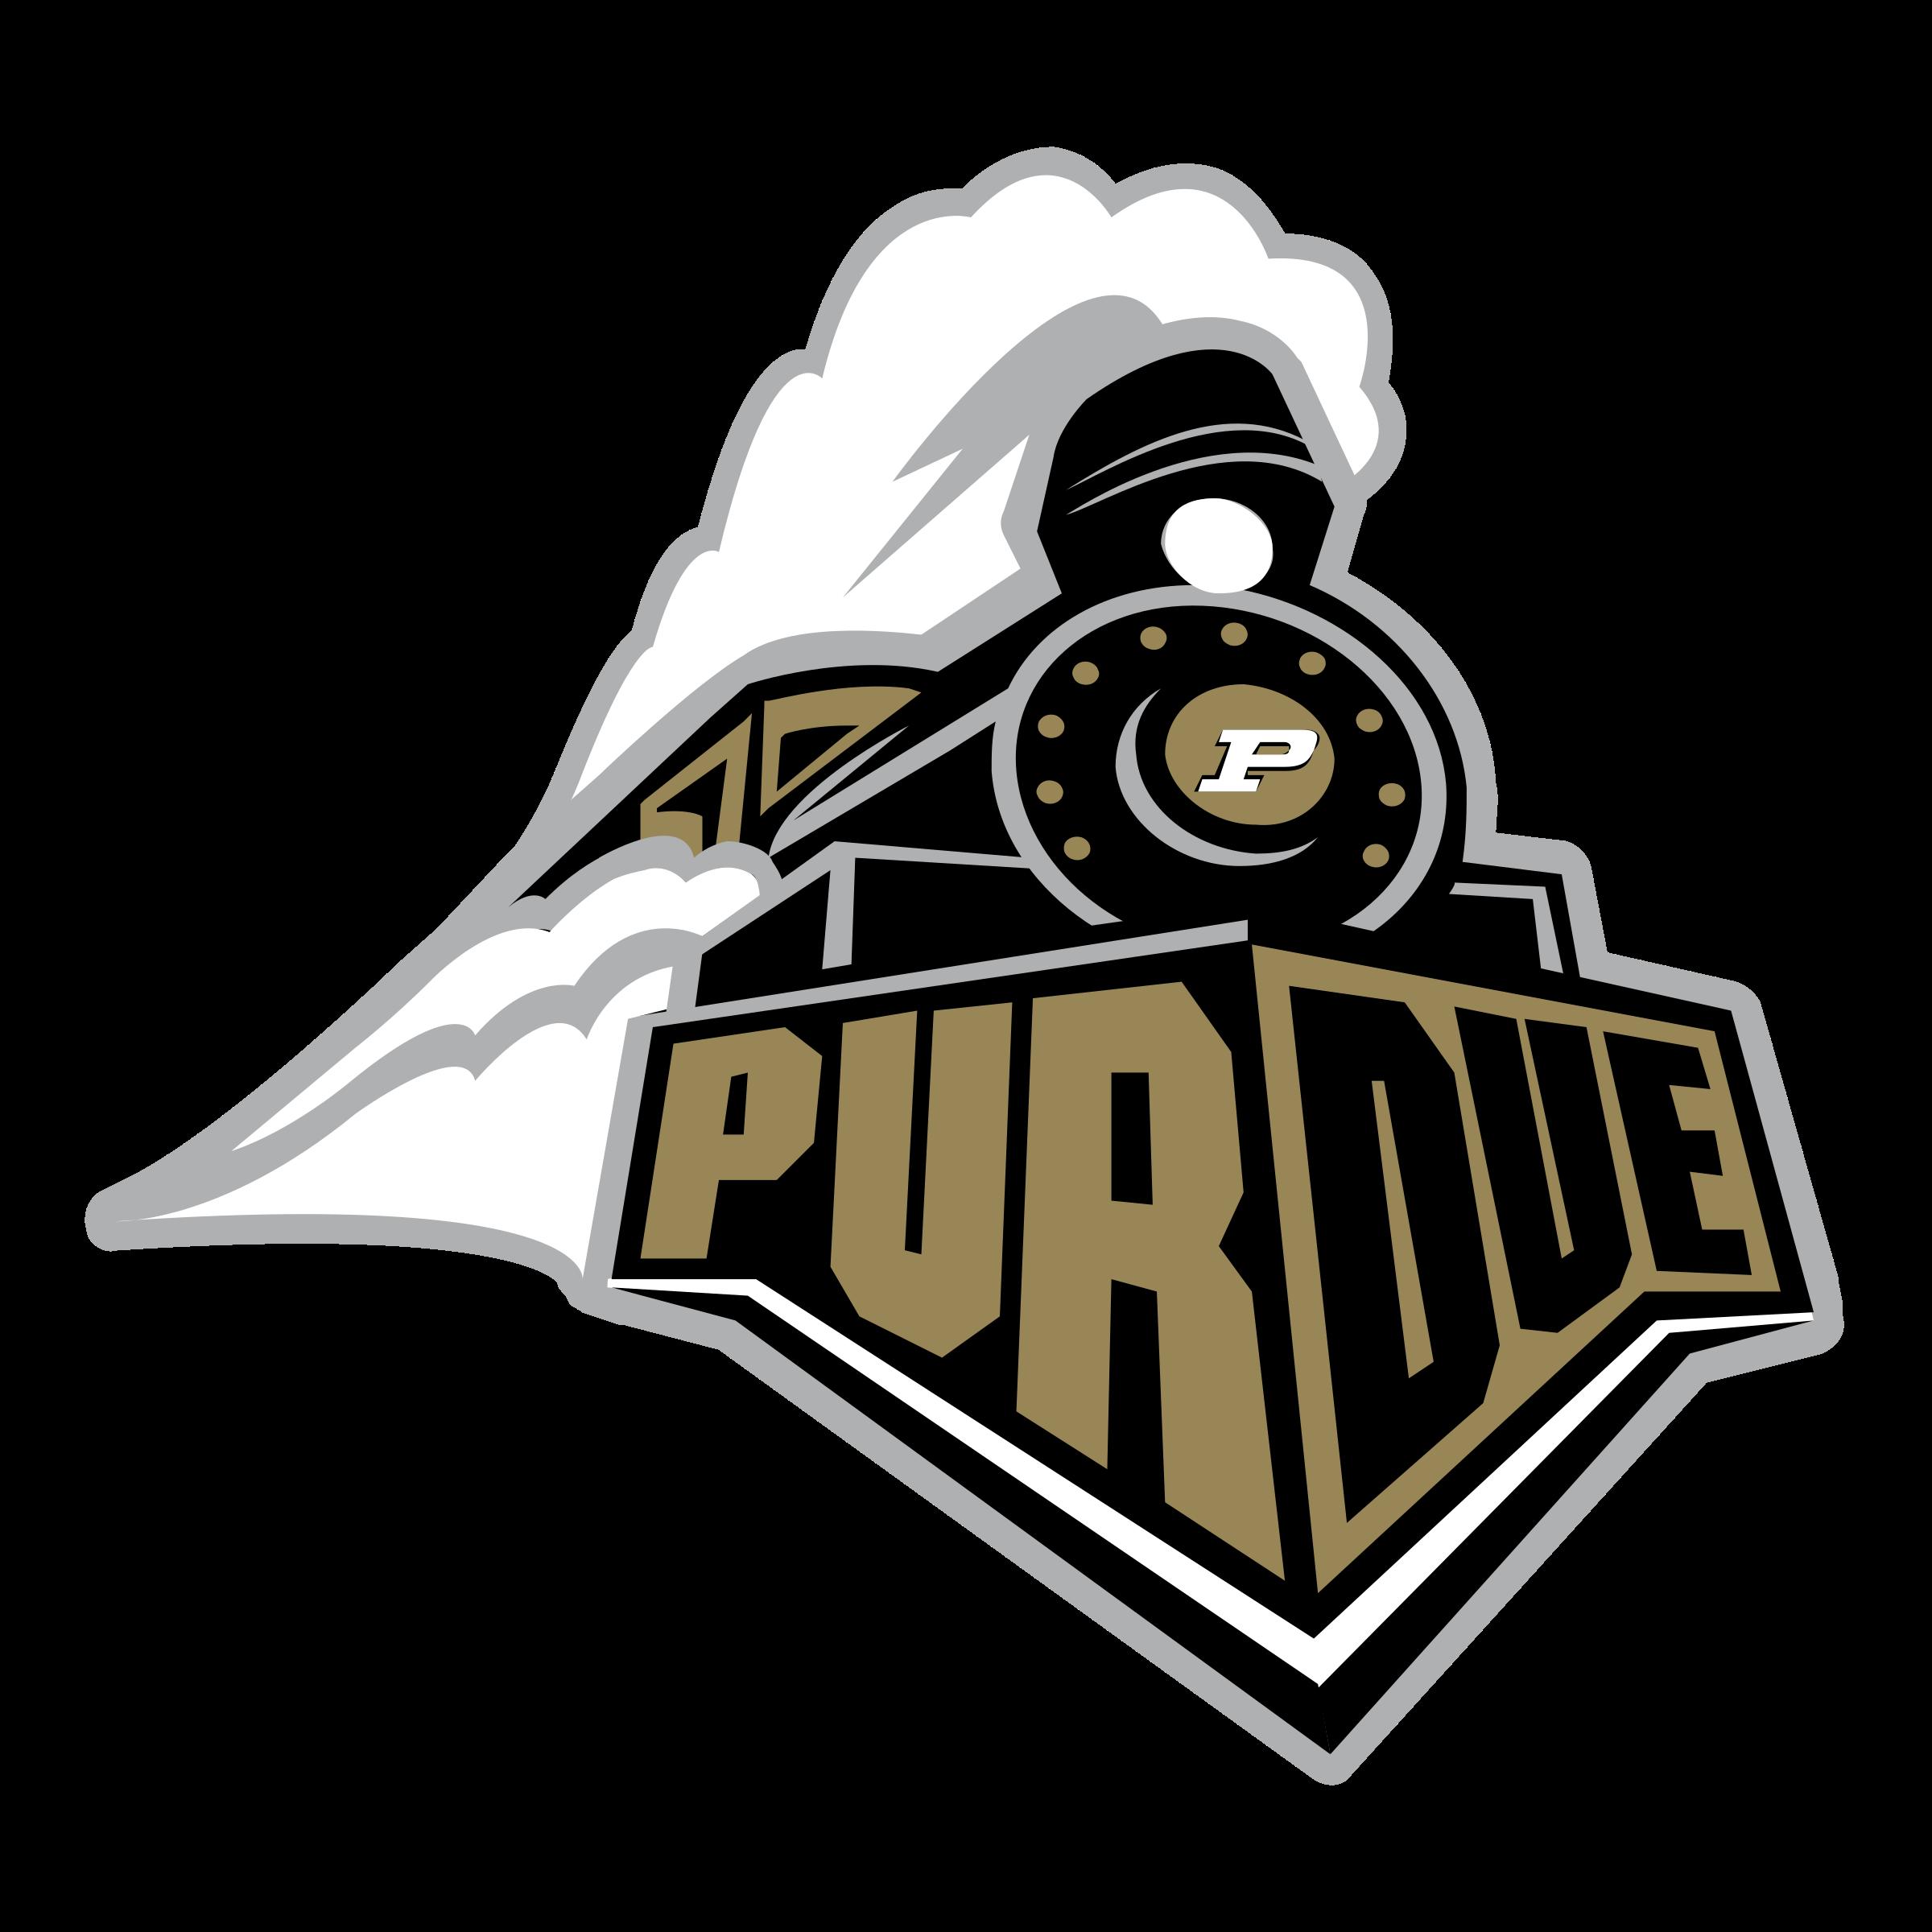 Purdue University BoilerMakers Logo PNG Transparent & SVG.